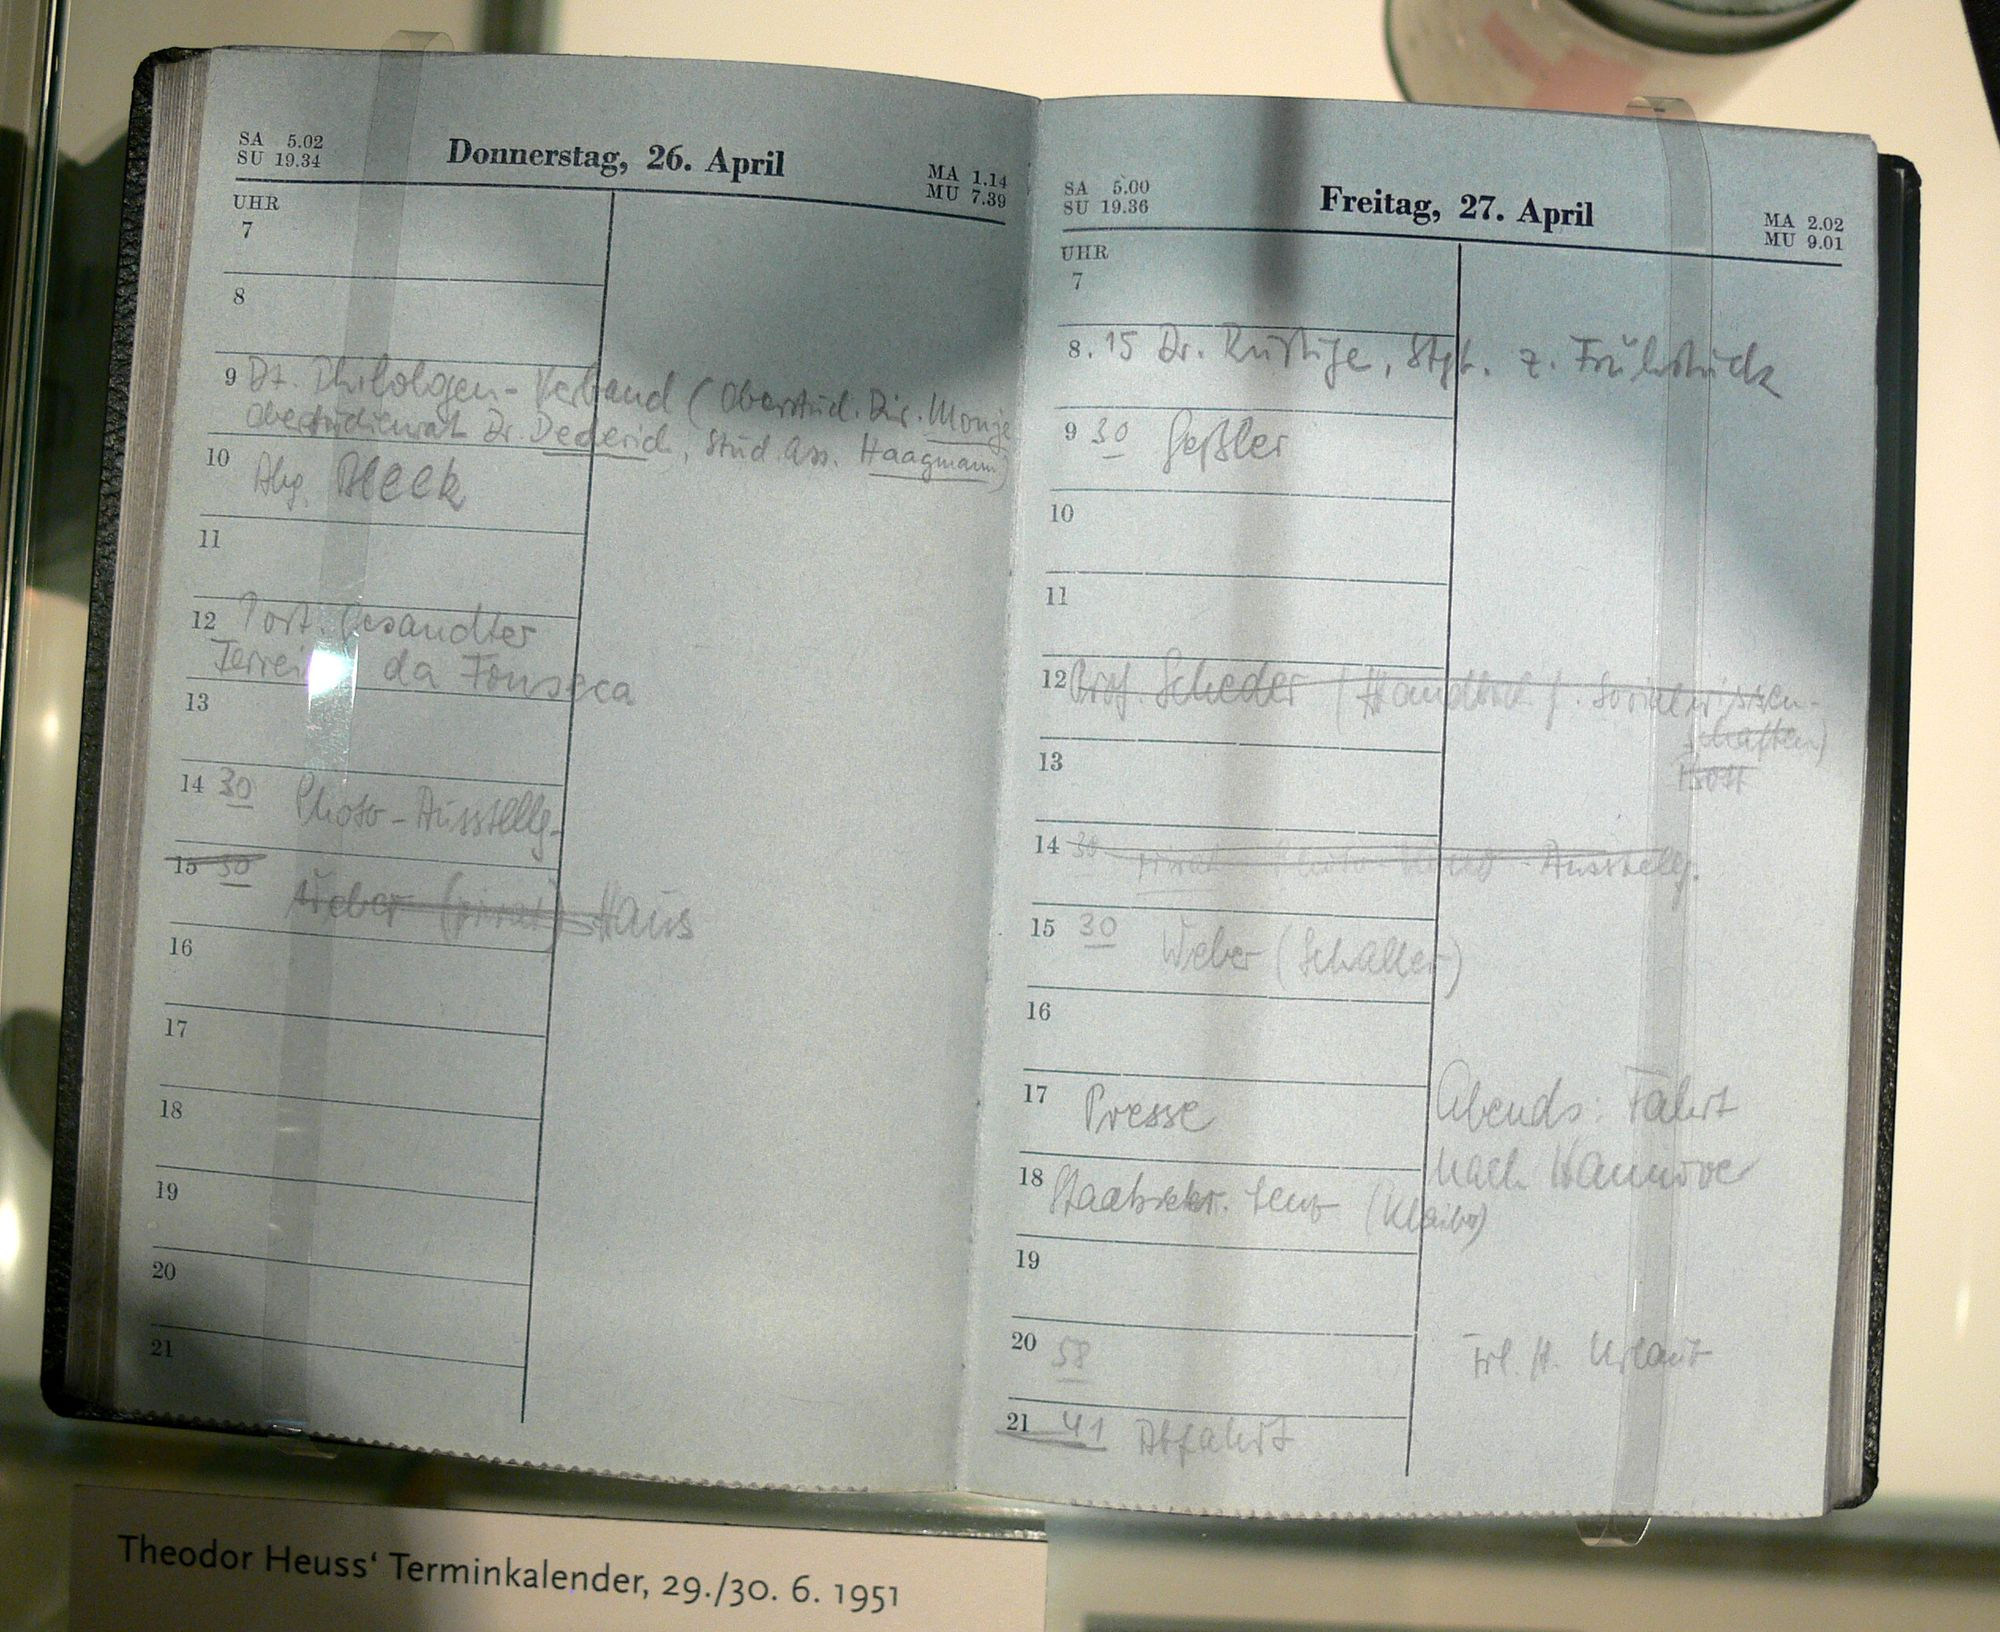 der Terminkalender, Plural: die Terminkalender